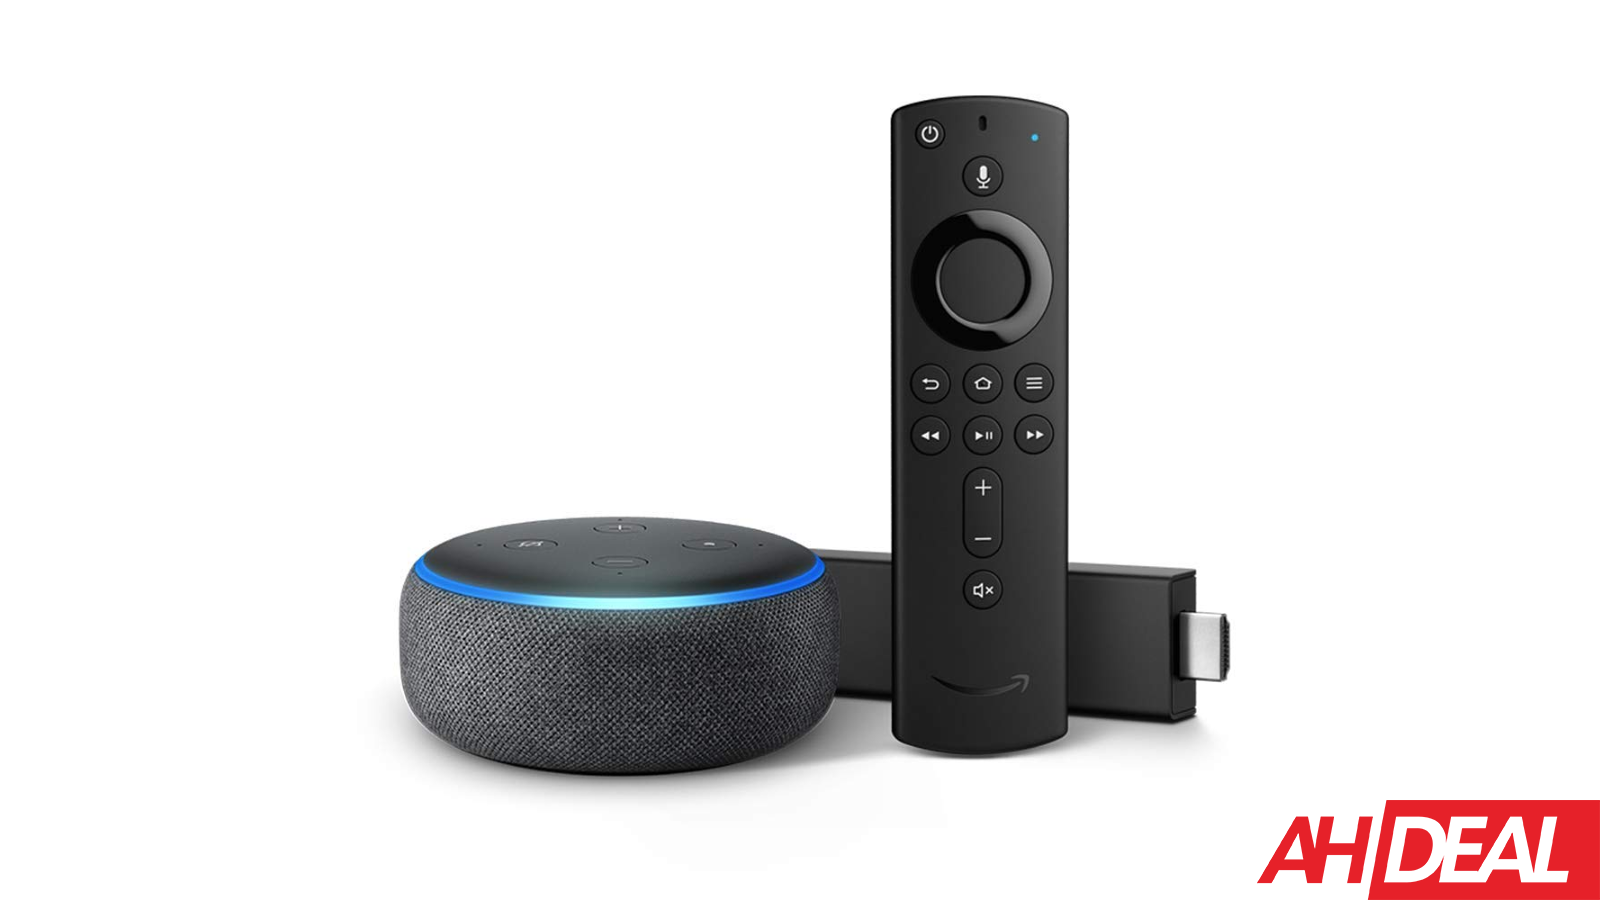 Amazon Fire TV Stick 4K & Echo Dot (3rd Gen) 59 Black